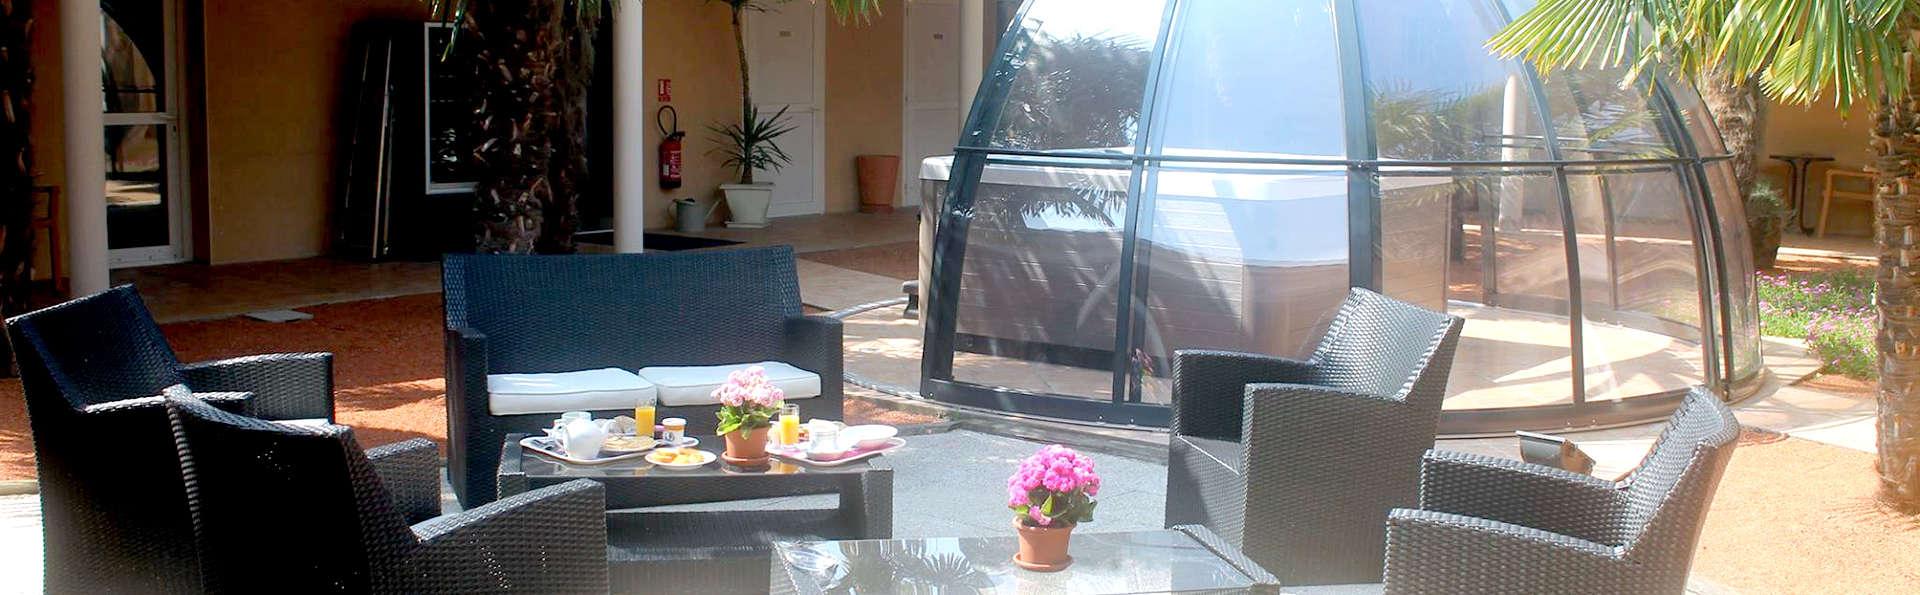 Hôtel Spa La Closerie - Edit_terrace.jpg